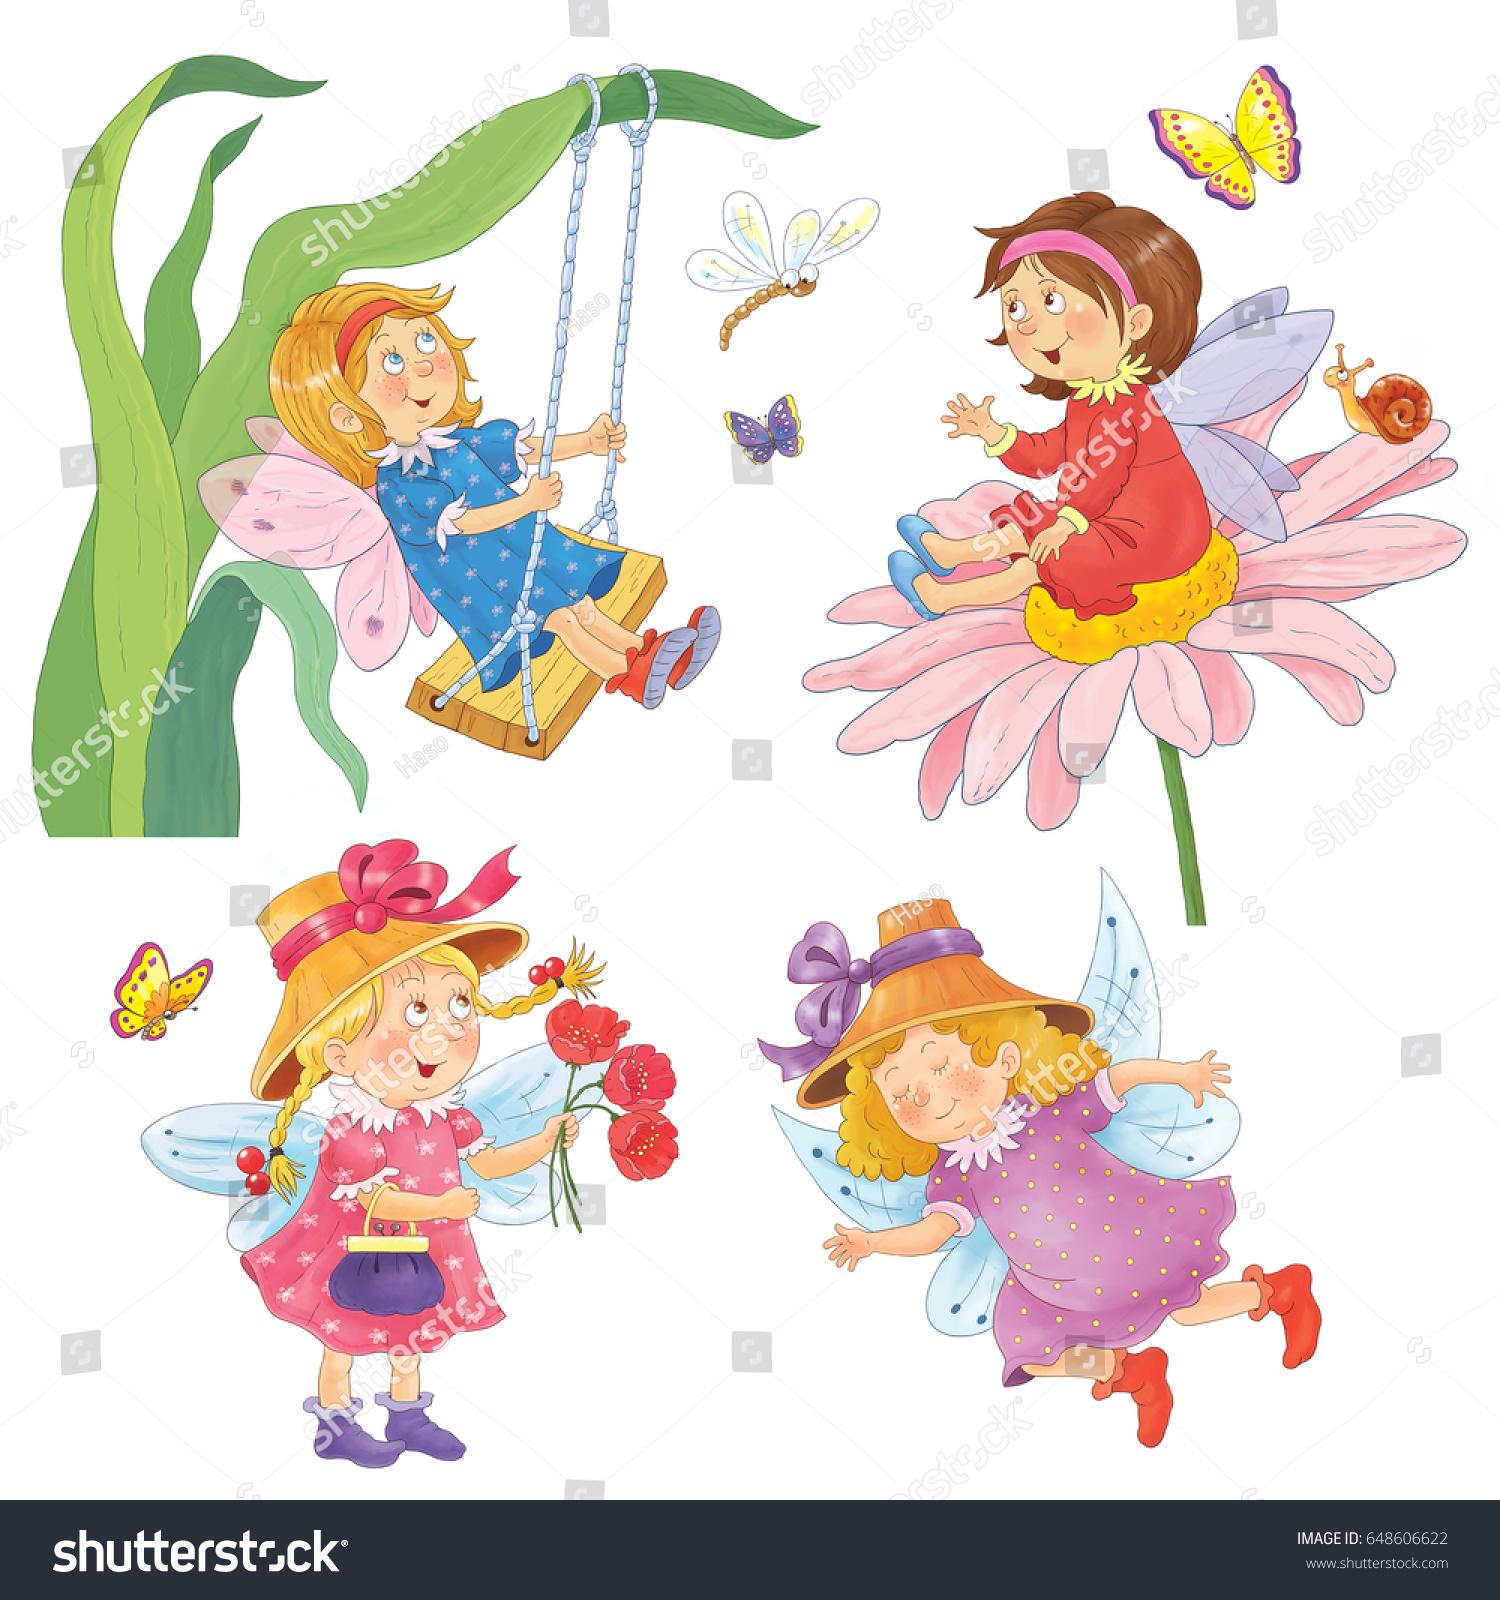 Four Cute Fairies Fairy Tale Coloring Stock Illustration 648606622 ...